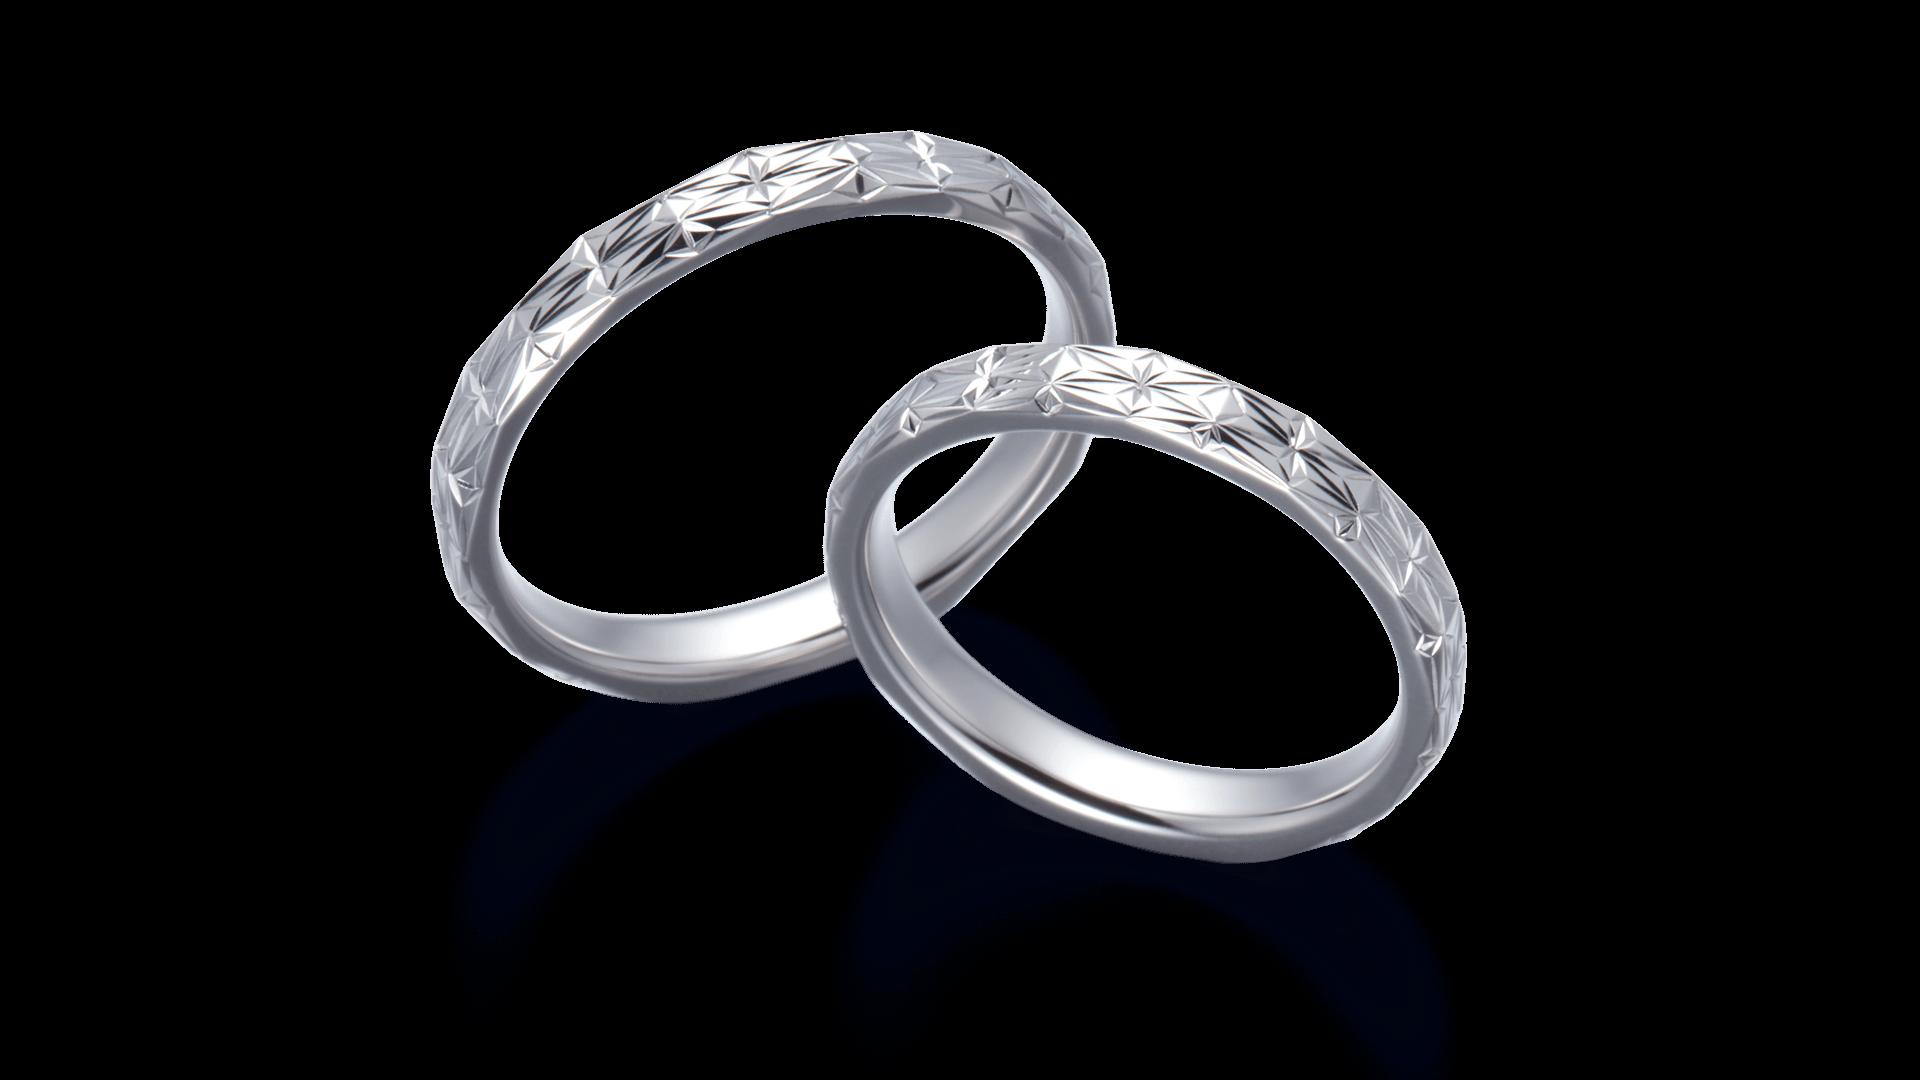 asanoha 麻の葉 | 結婚指輪サムネイル 2